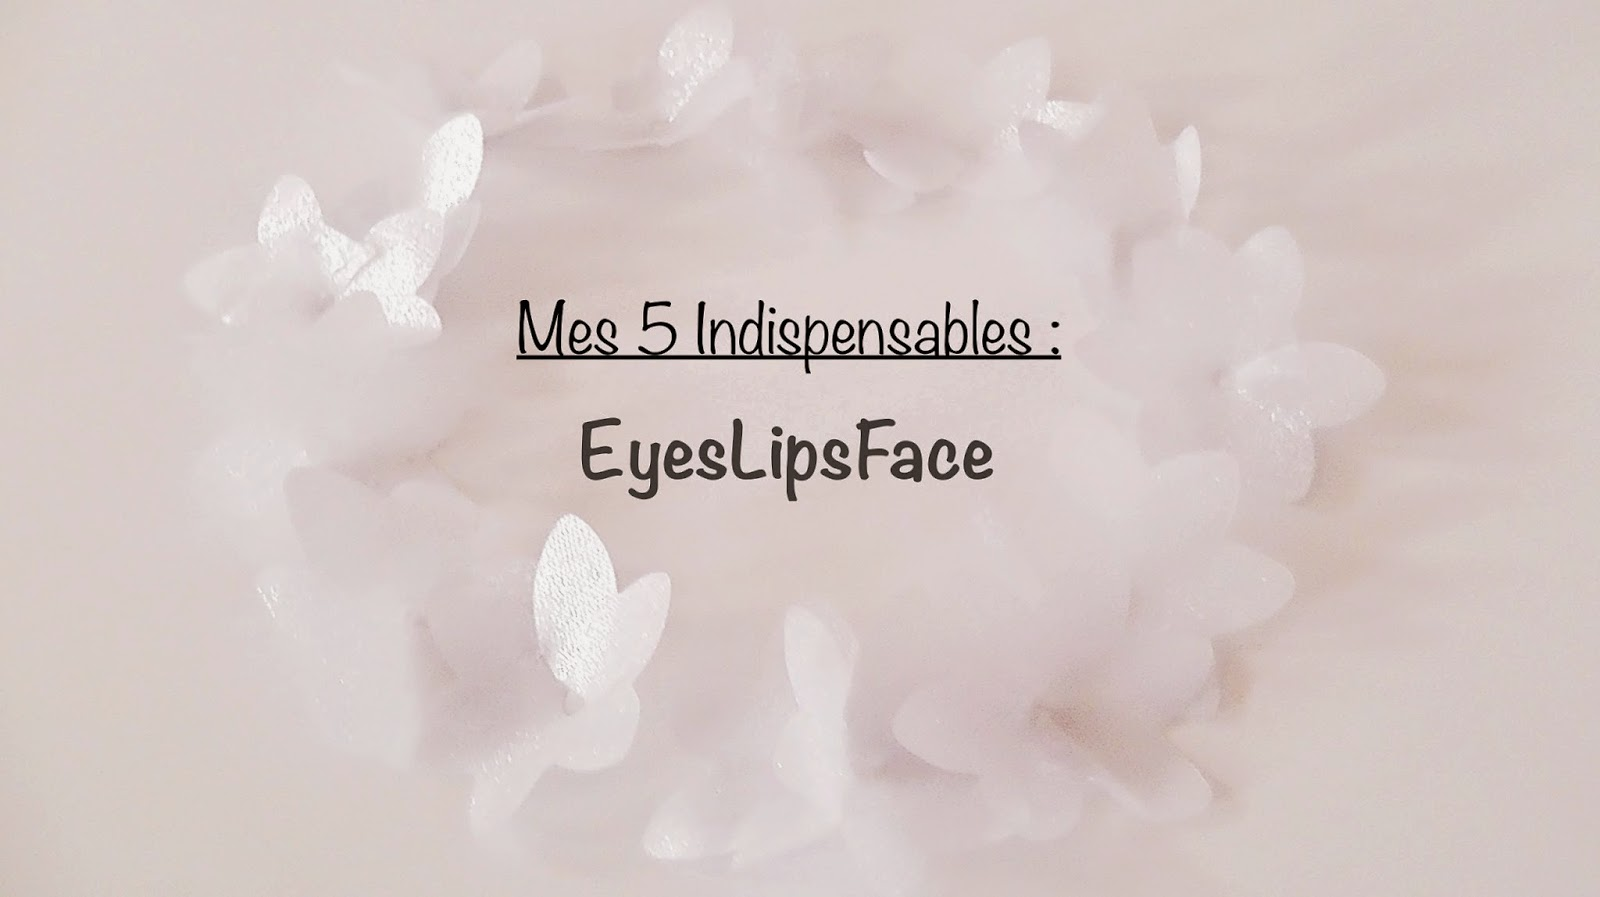 eyeslipsface-5-indispensables